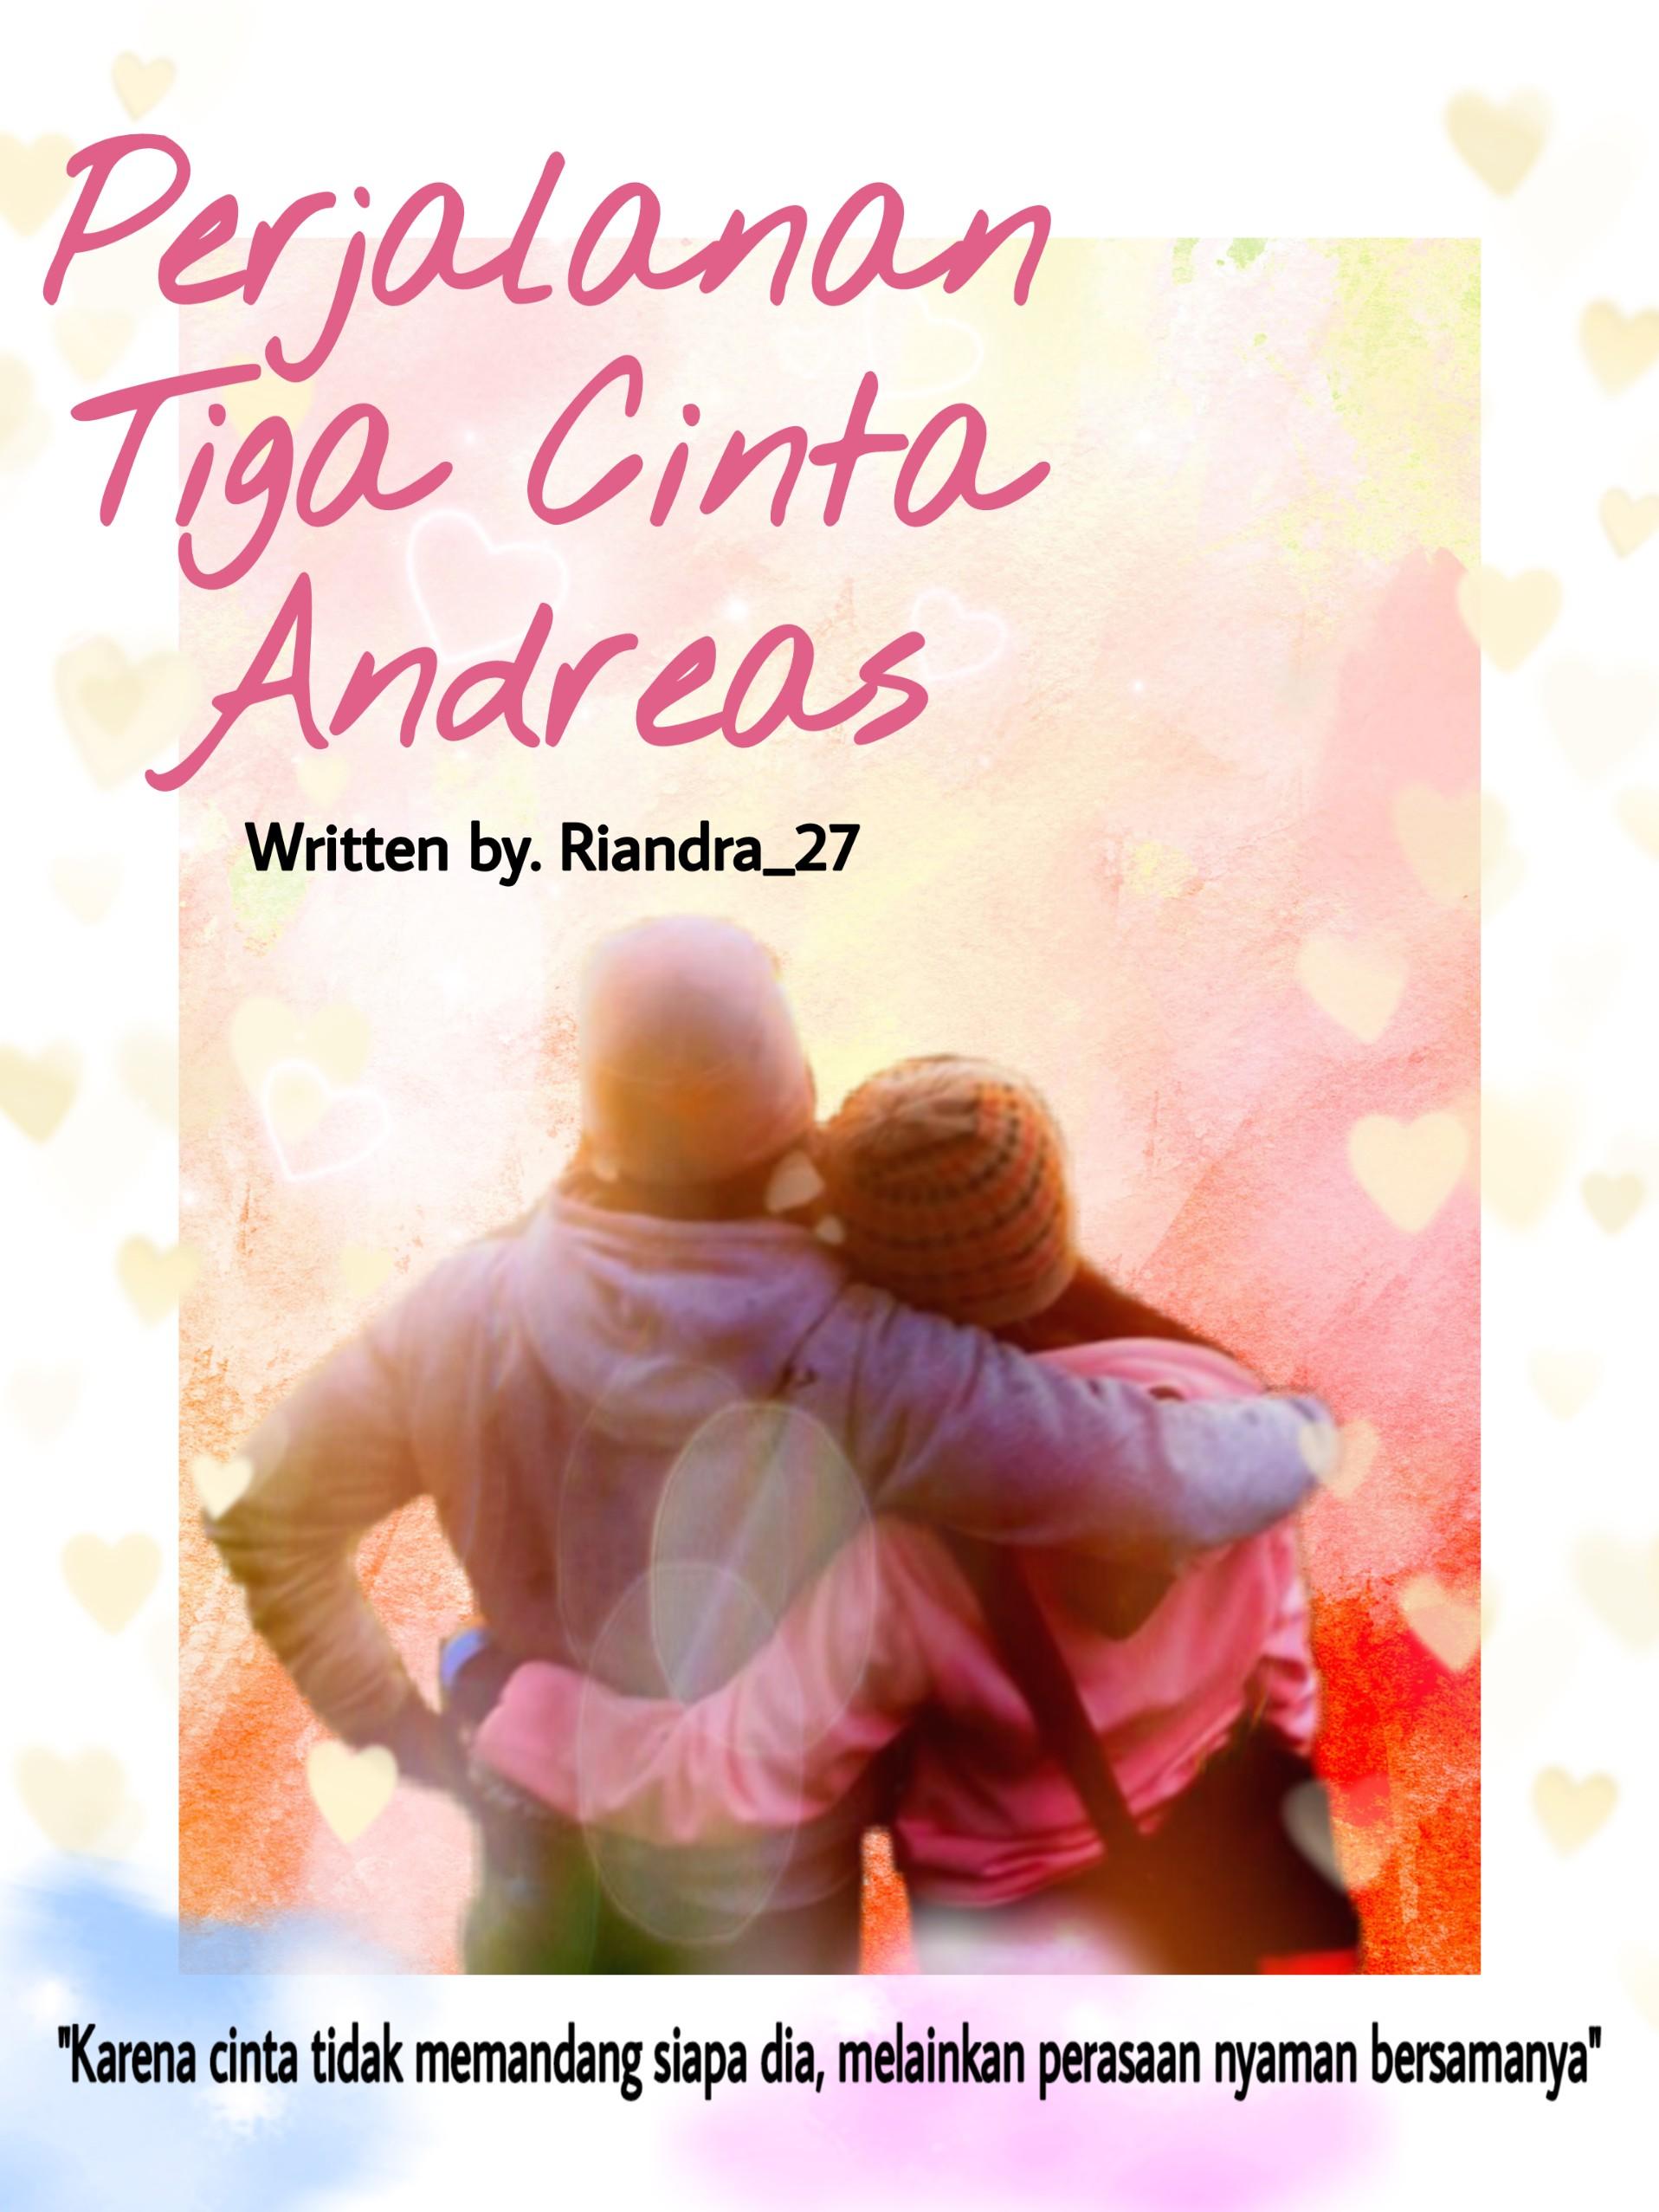 Perjalanan Tiga Cinta Andreas